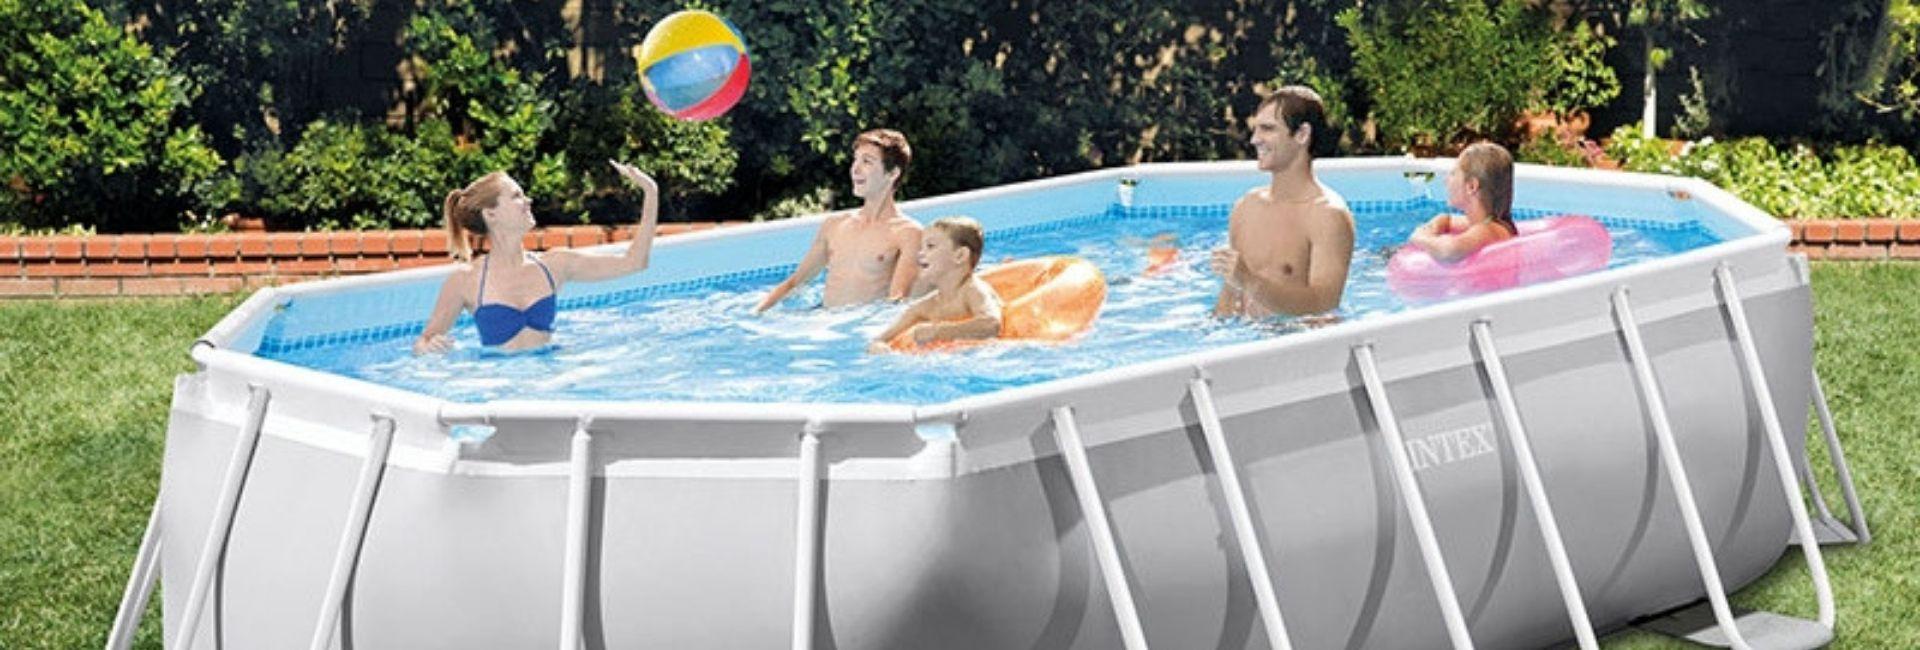 Comment utiliser une piscine hors sol ?